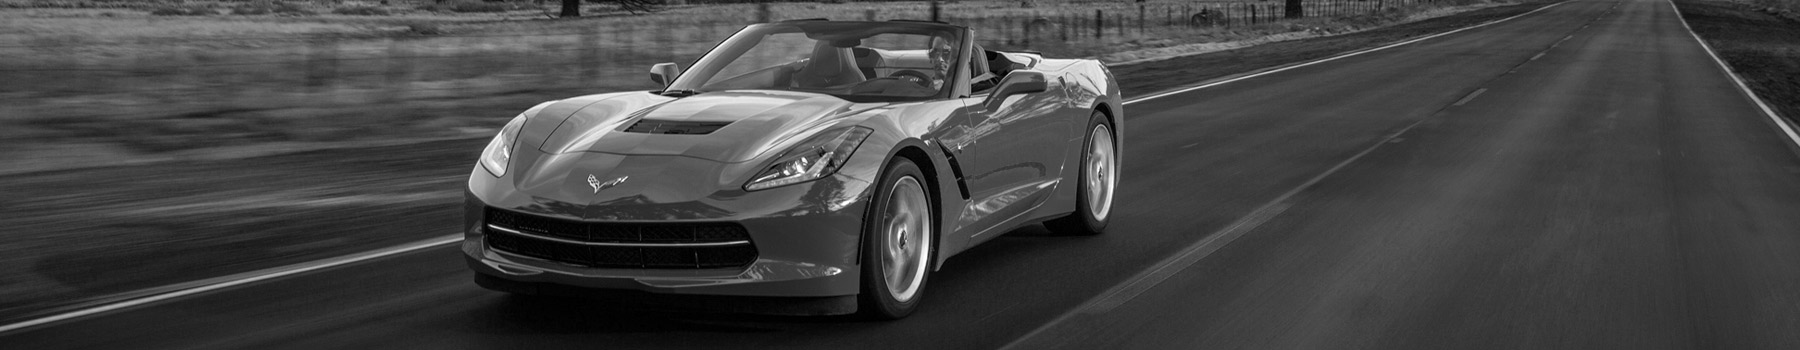 c7 corvette 2014-present